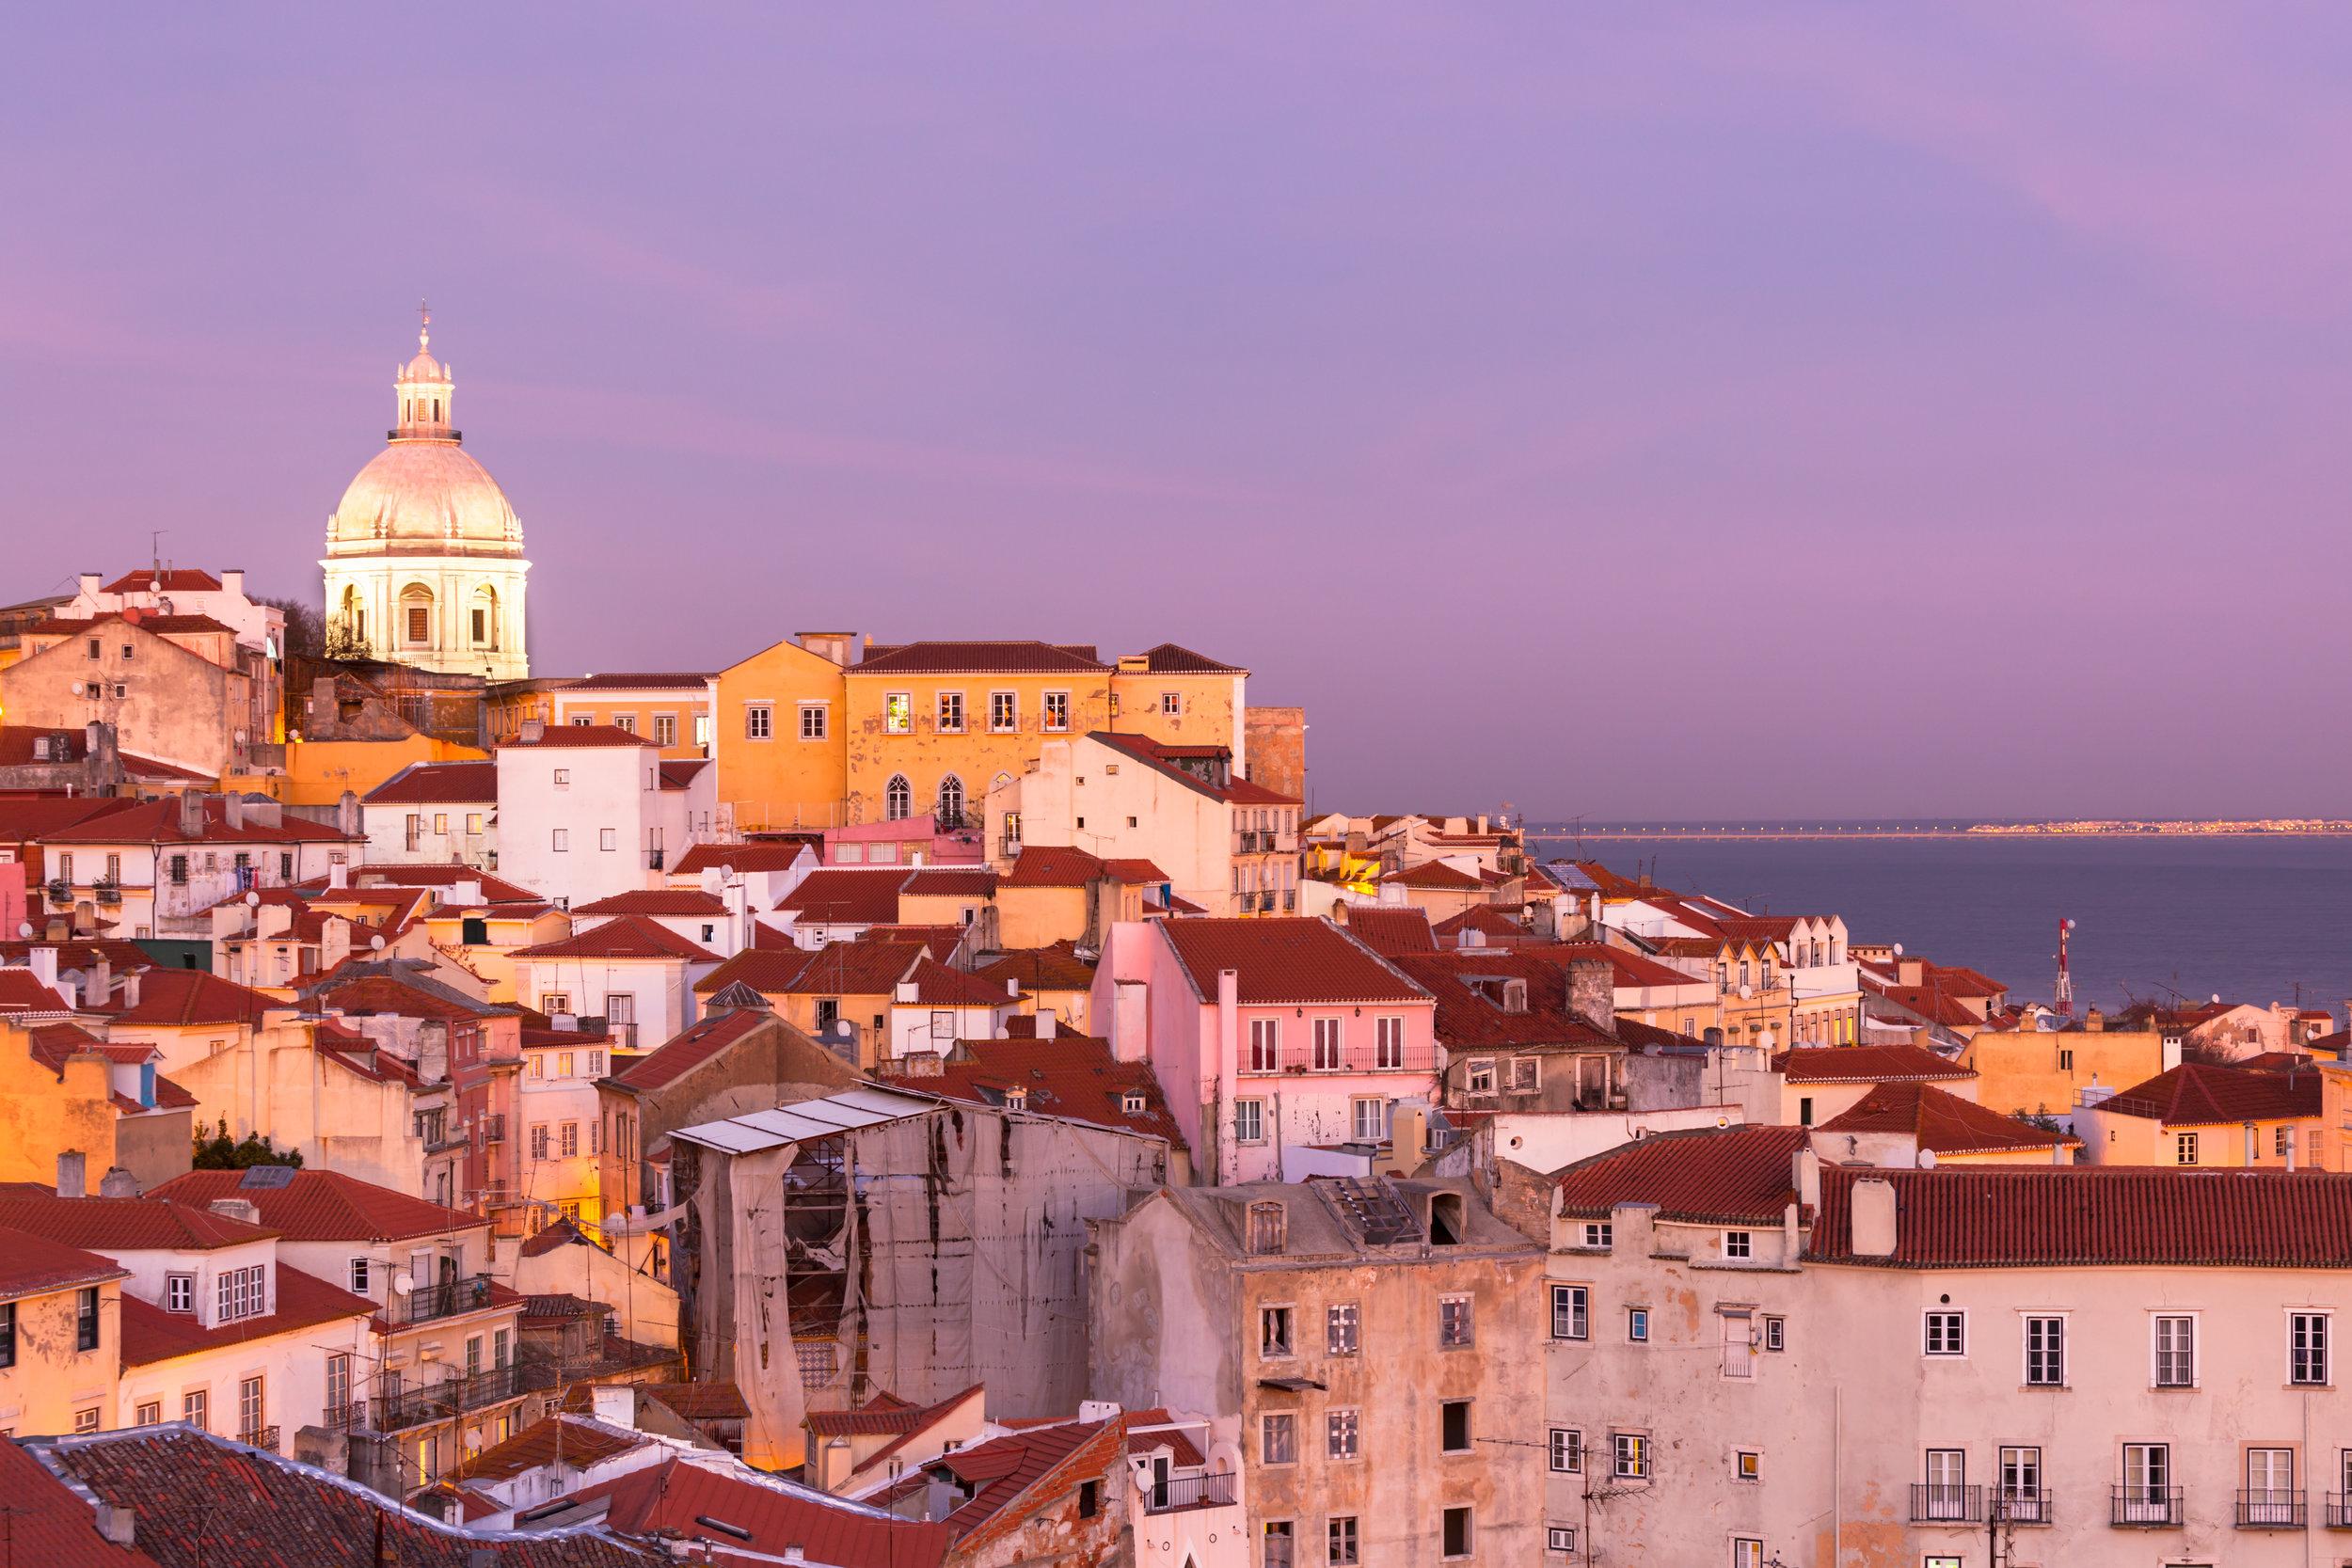 bigstock-Old-Lisbon-At-Sunset-42822436.jpg